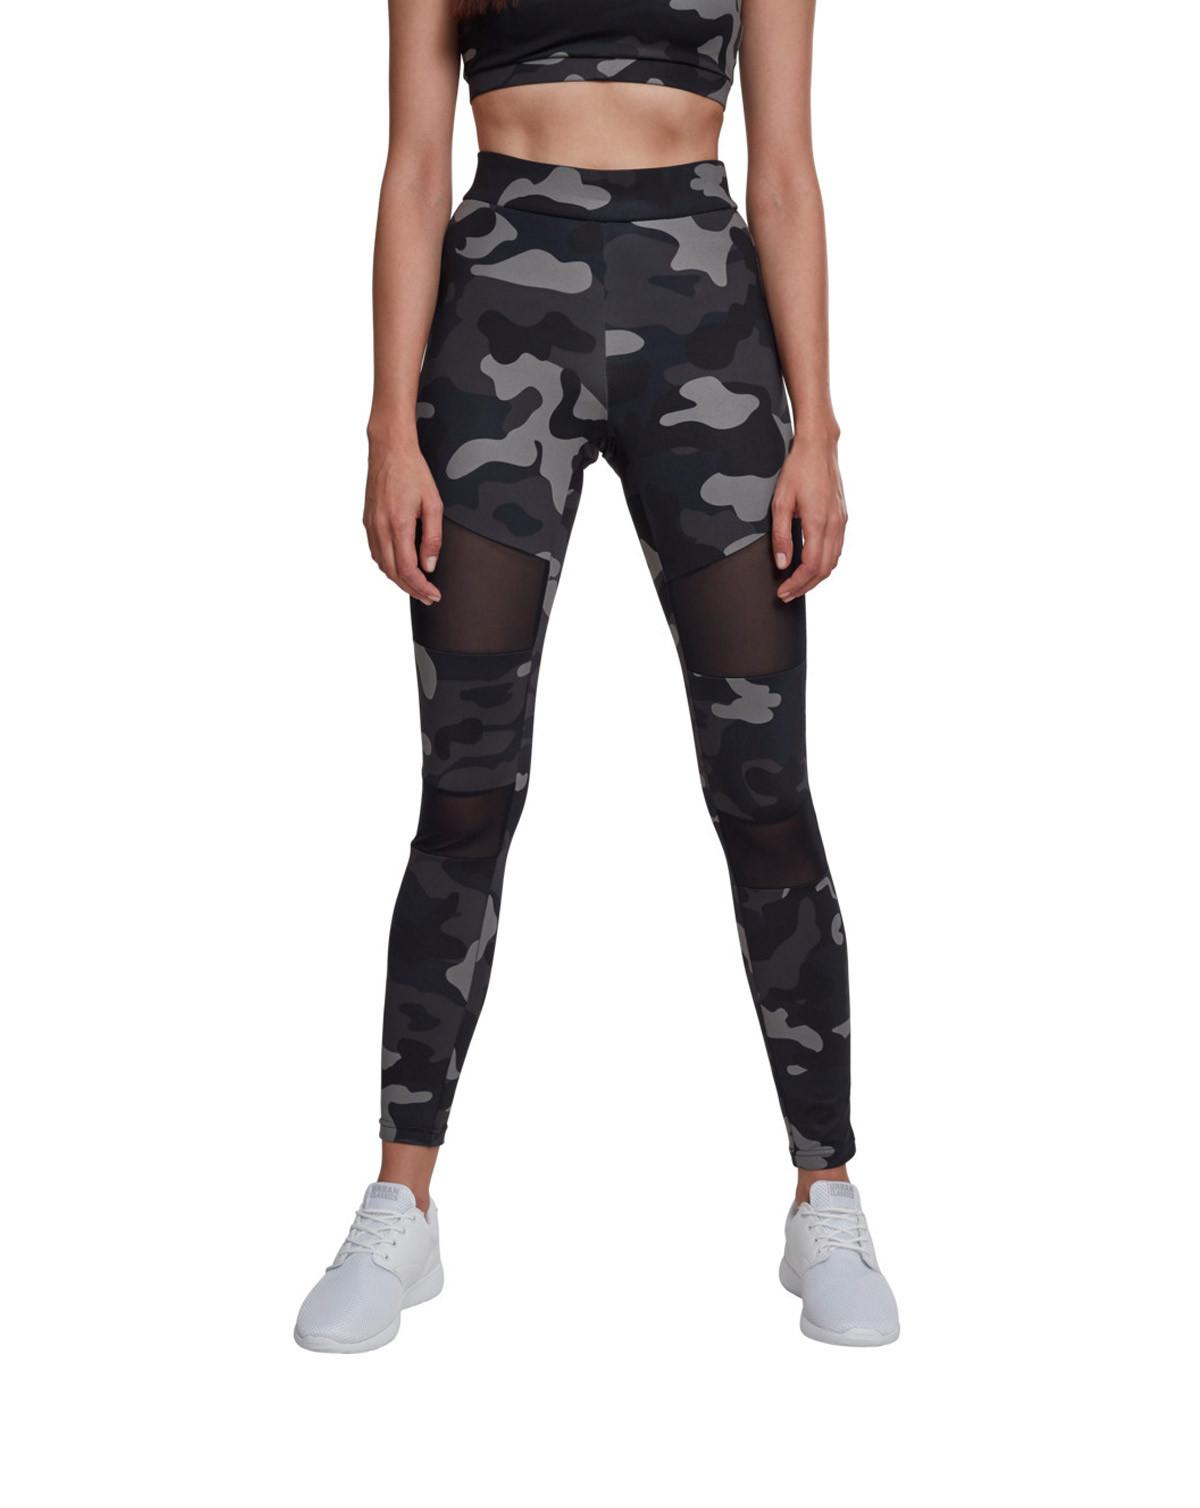 Urban Classics Kamouflage Leggings m. Mesh (Dark Camo, 2XL)